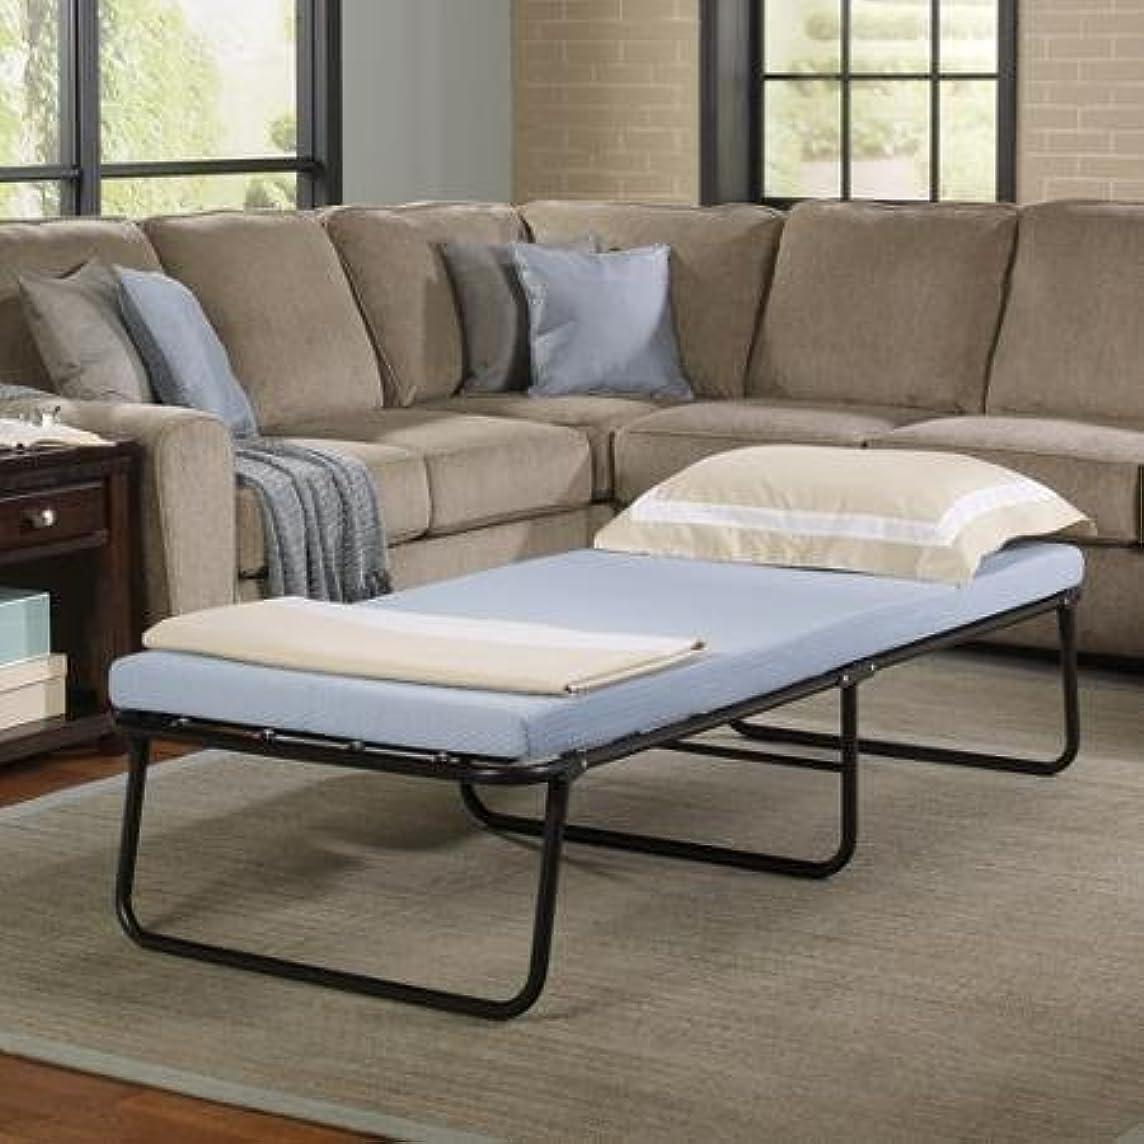 Simmons Foldaway Folding Bed Cot with Memory Foam Mattress